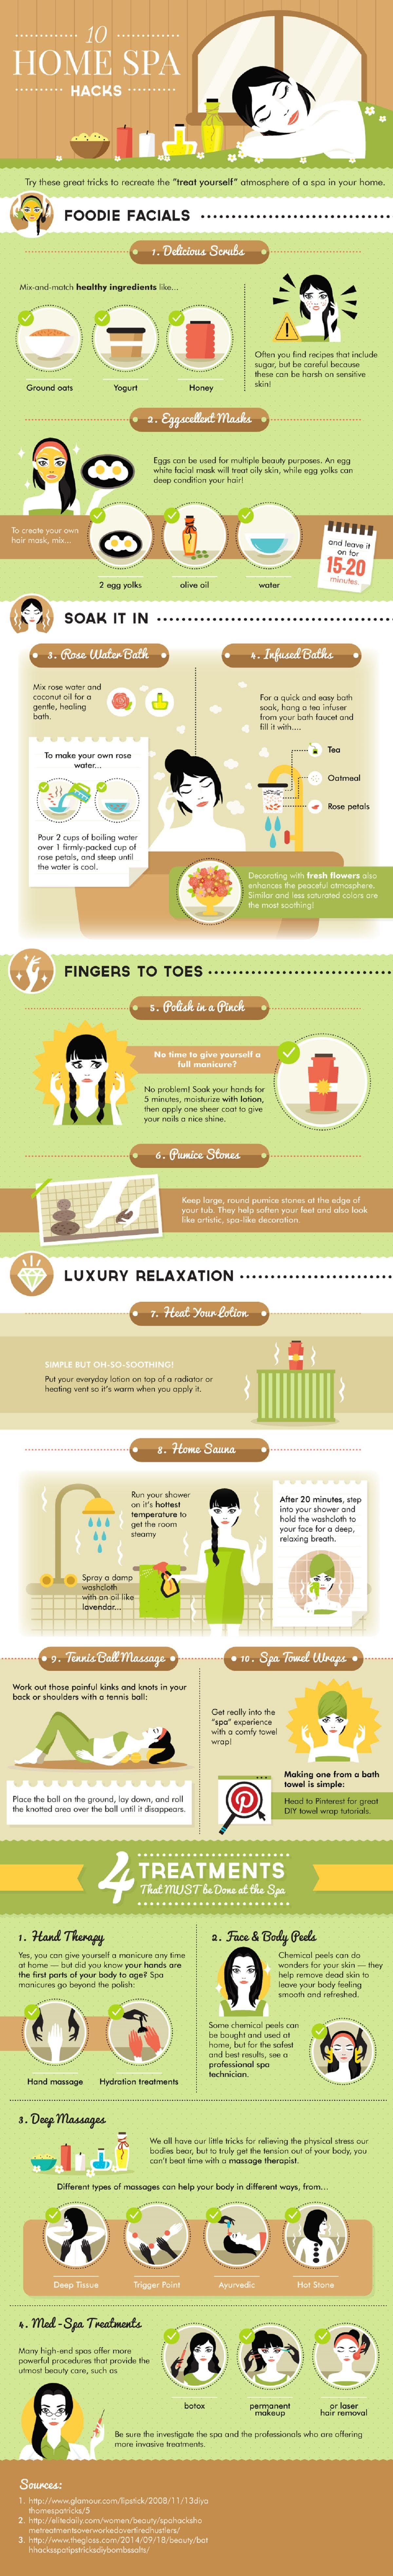 10-home-spa-hacks-infographic